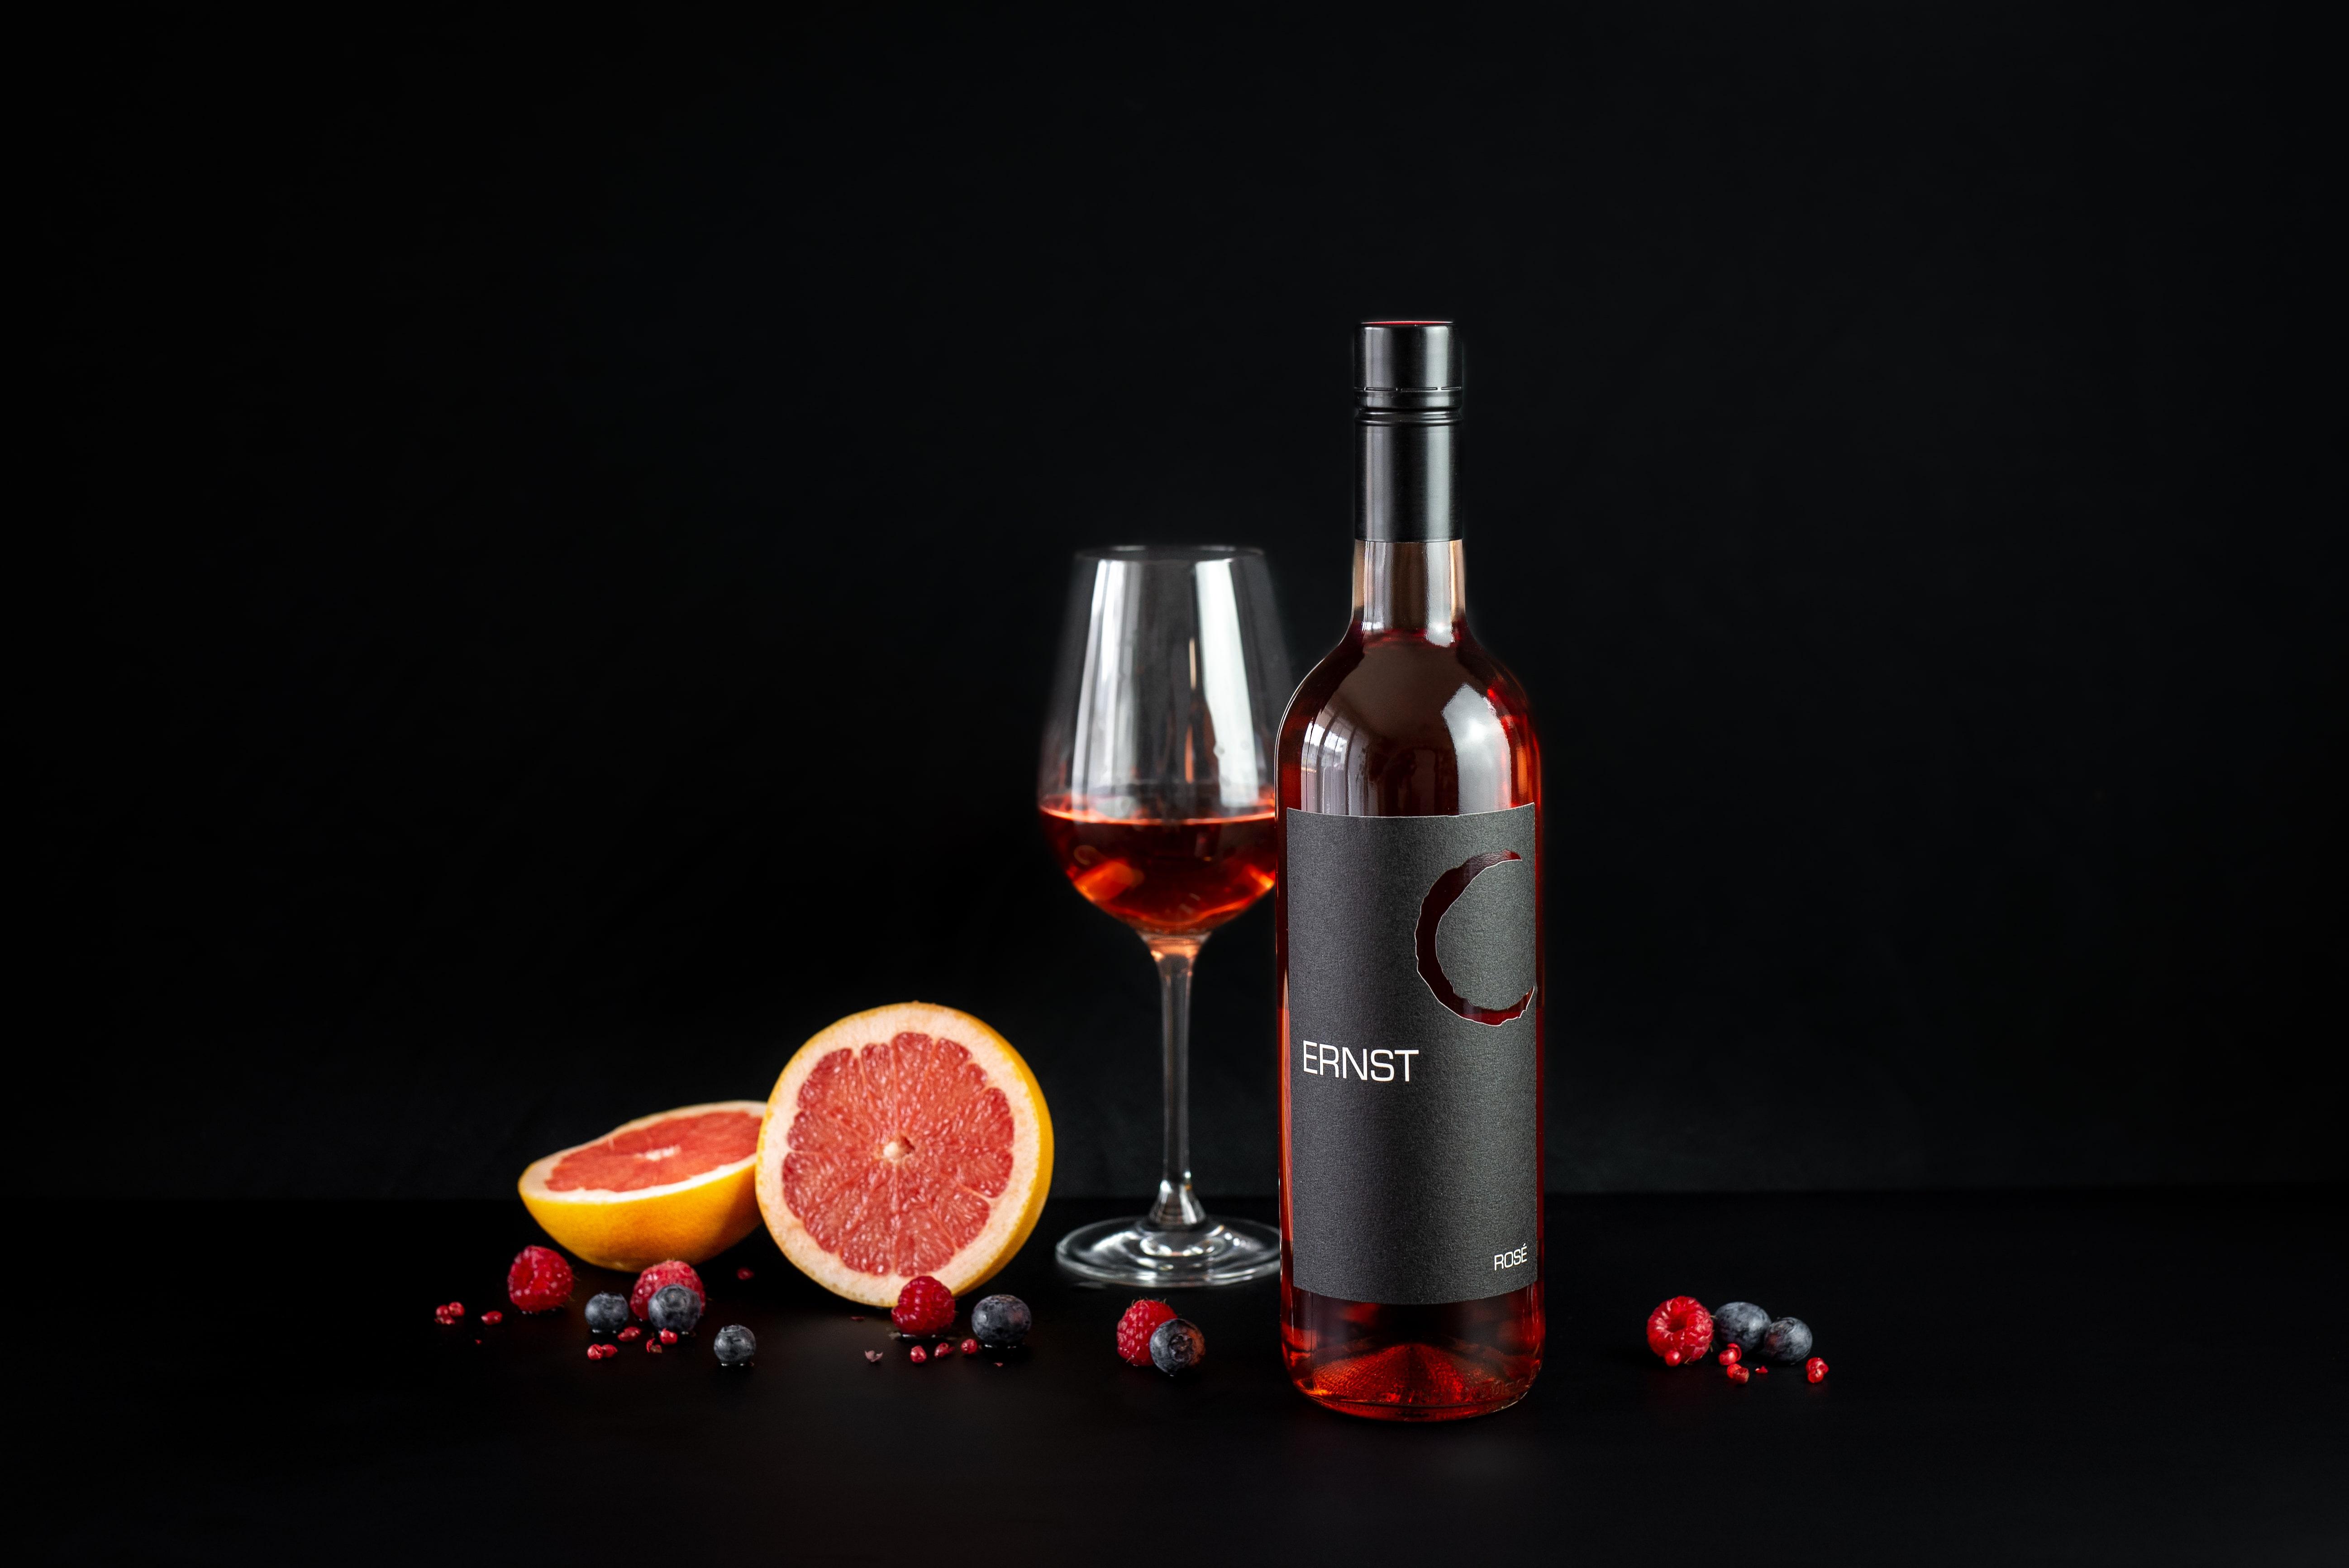 WineIsFine